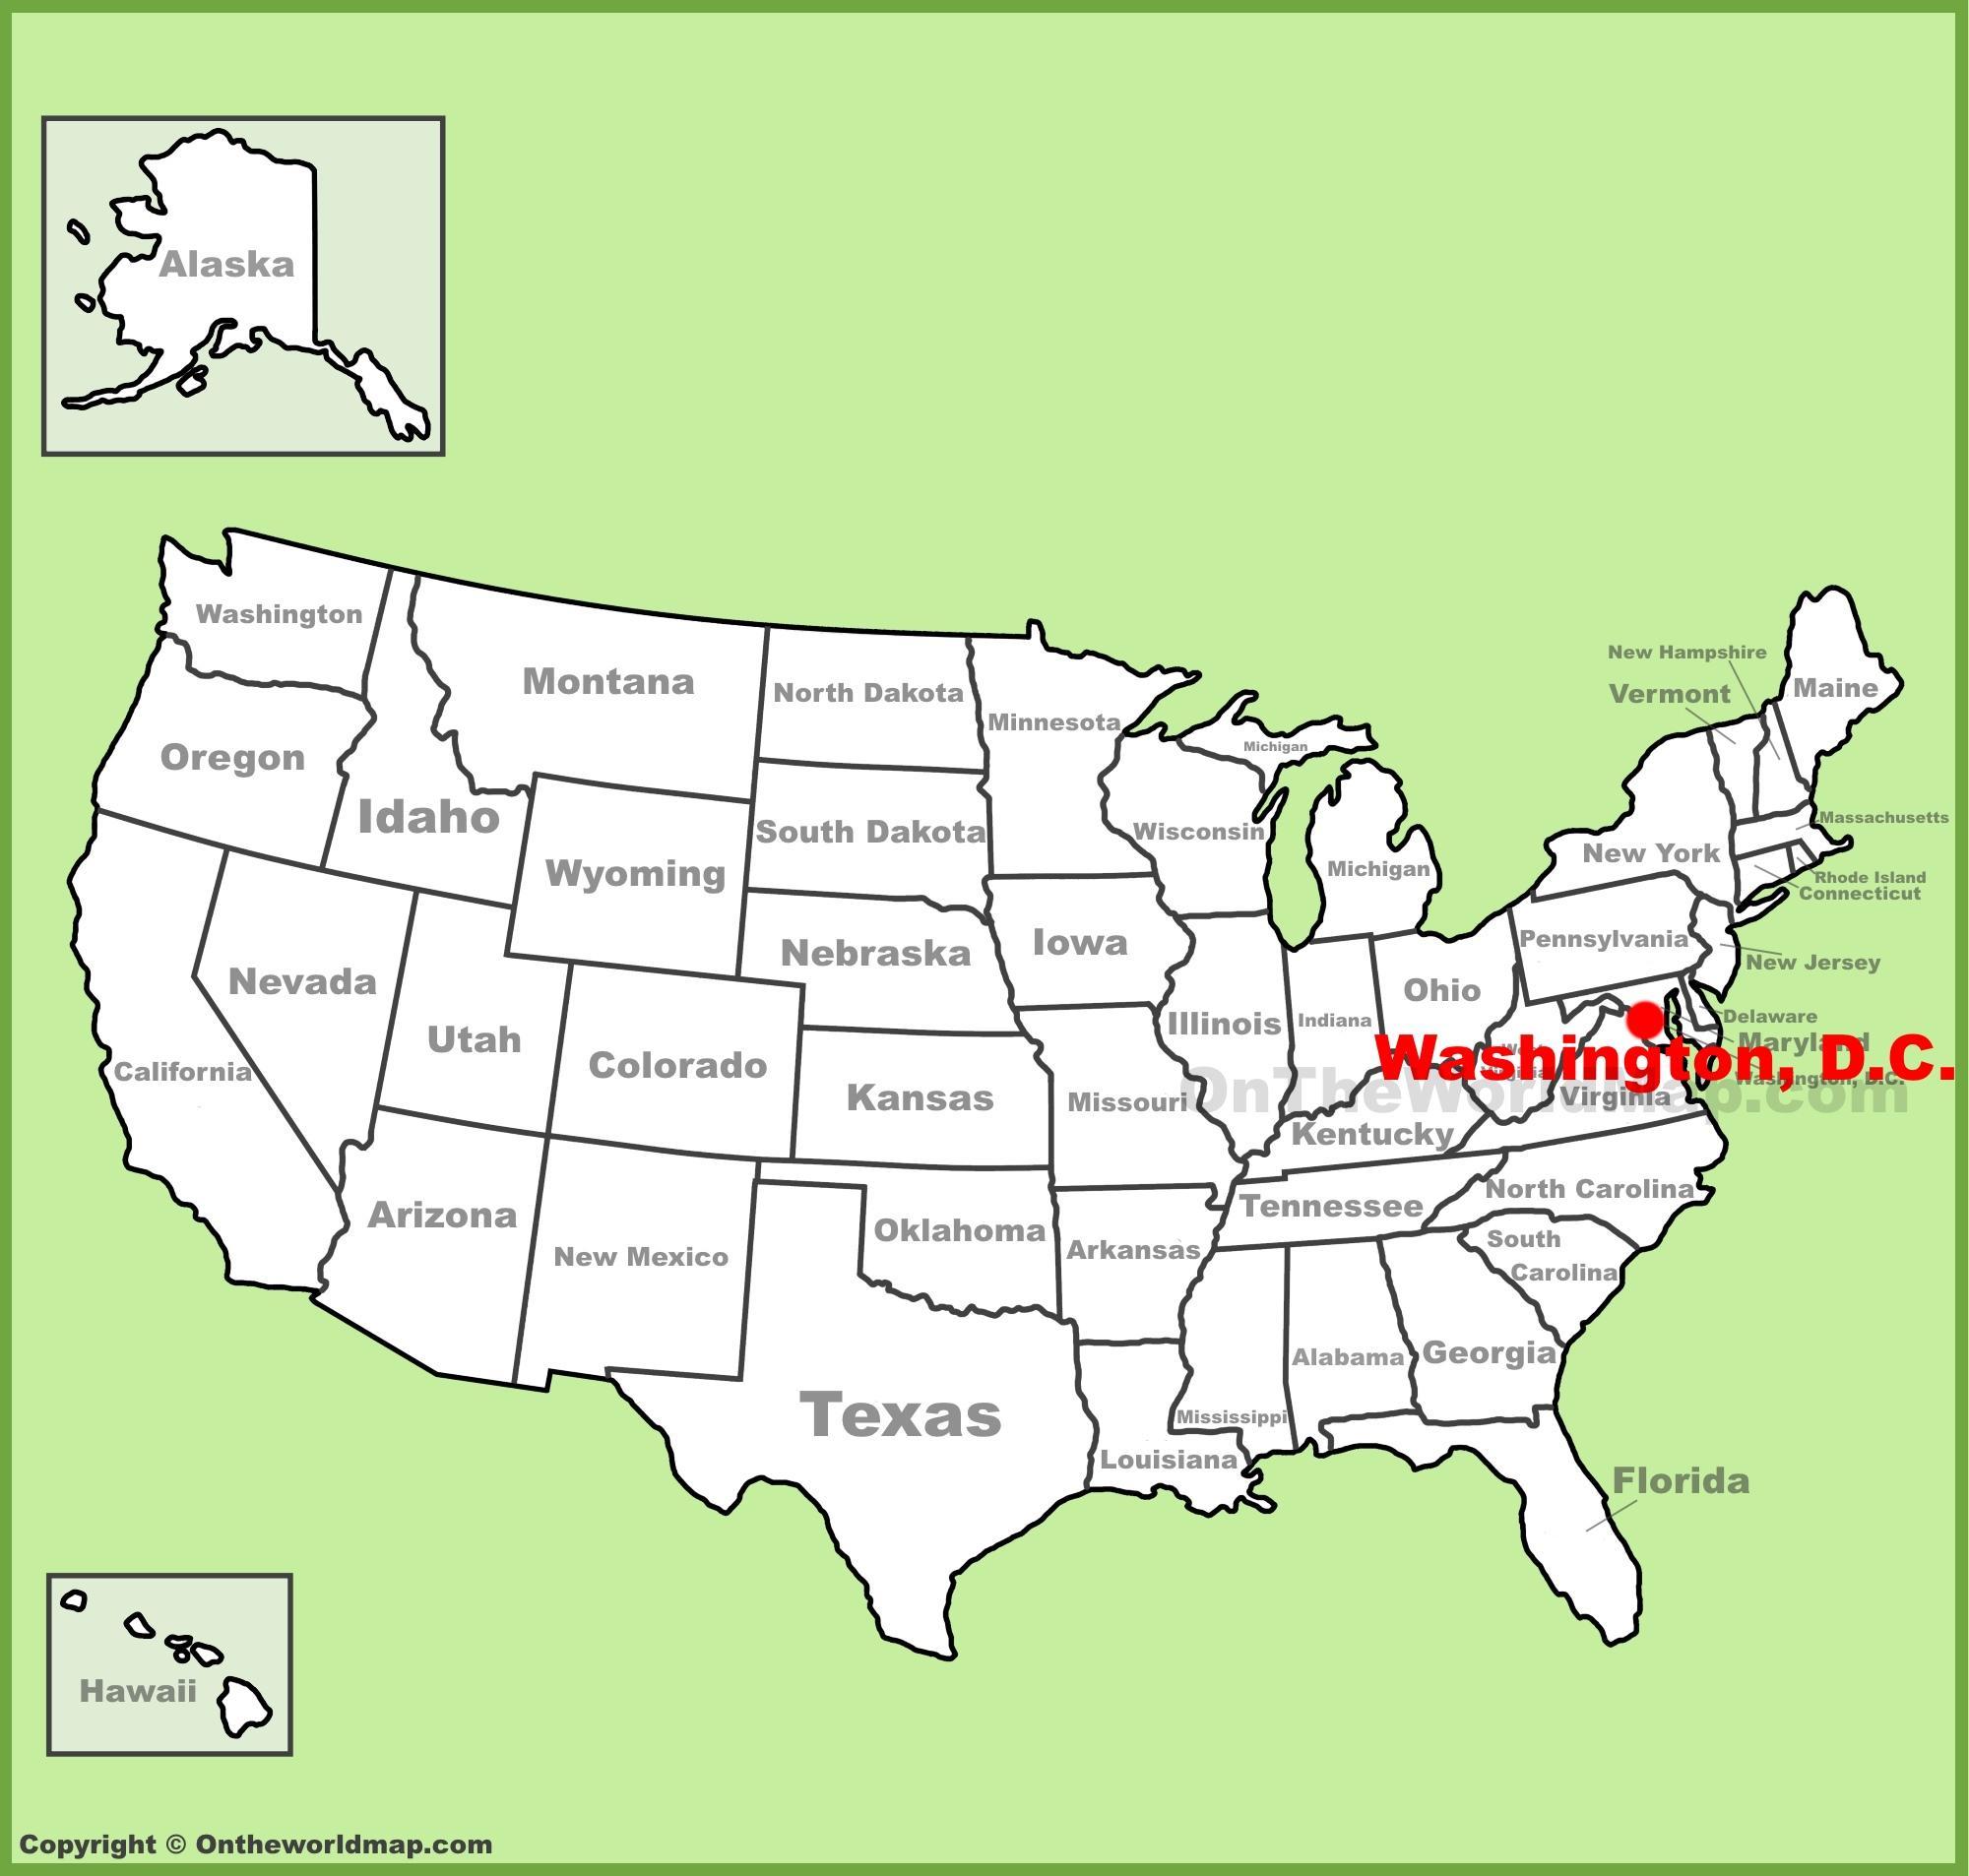 Washington Dc On Map Washington Dc On Map Of America District